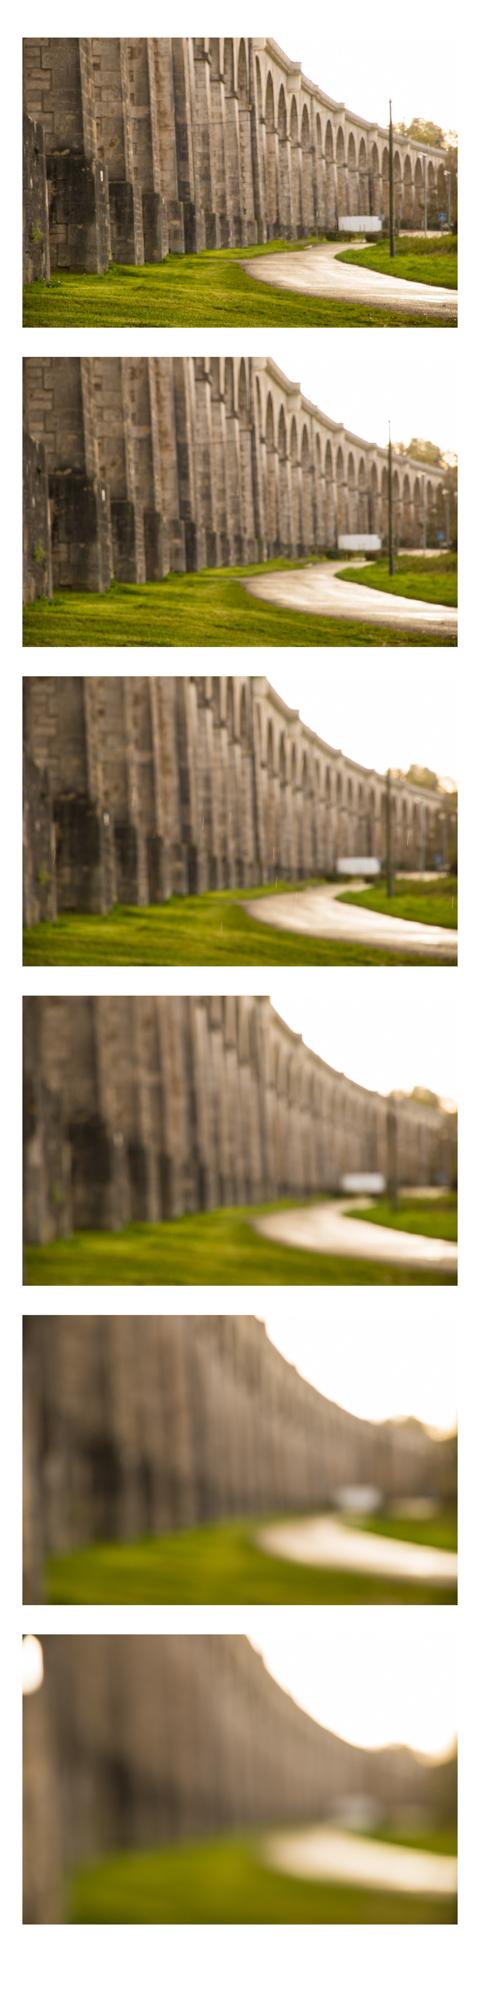 out focus 2.jpg